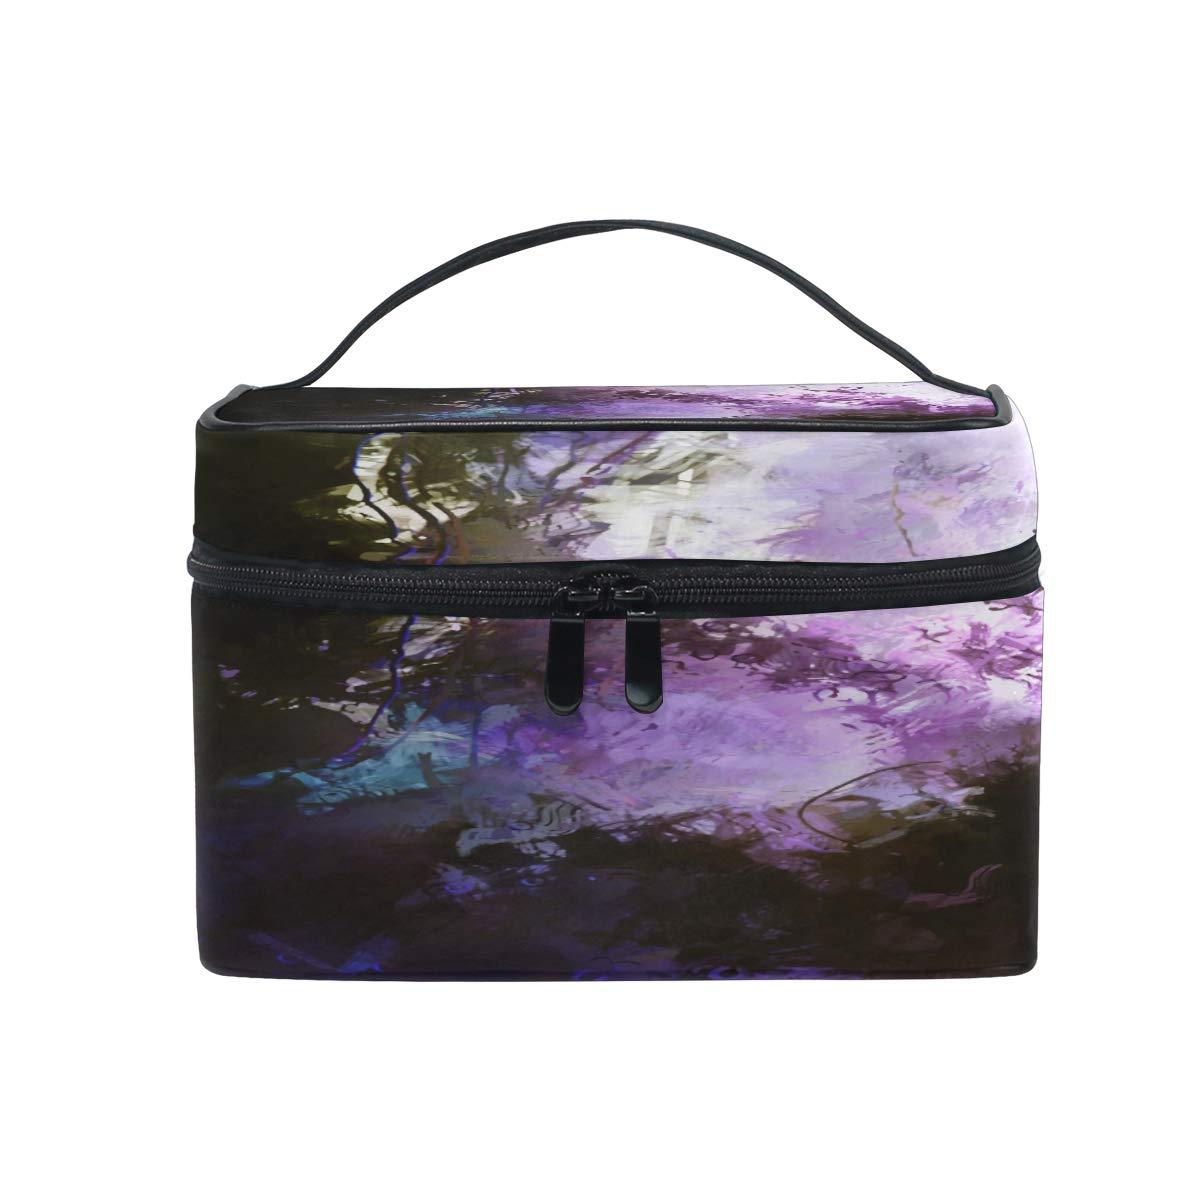 Makeup Bag Modern Art Unknown Jungle Cosmetic Bag Travel Toiletry Bag Cosmetic Train Case Makeup Tote Make-Up Organizer Box Storage With Mesh Bag Brush Holder for Women Kids Men Girls